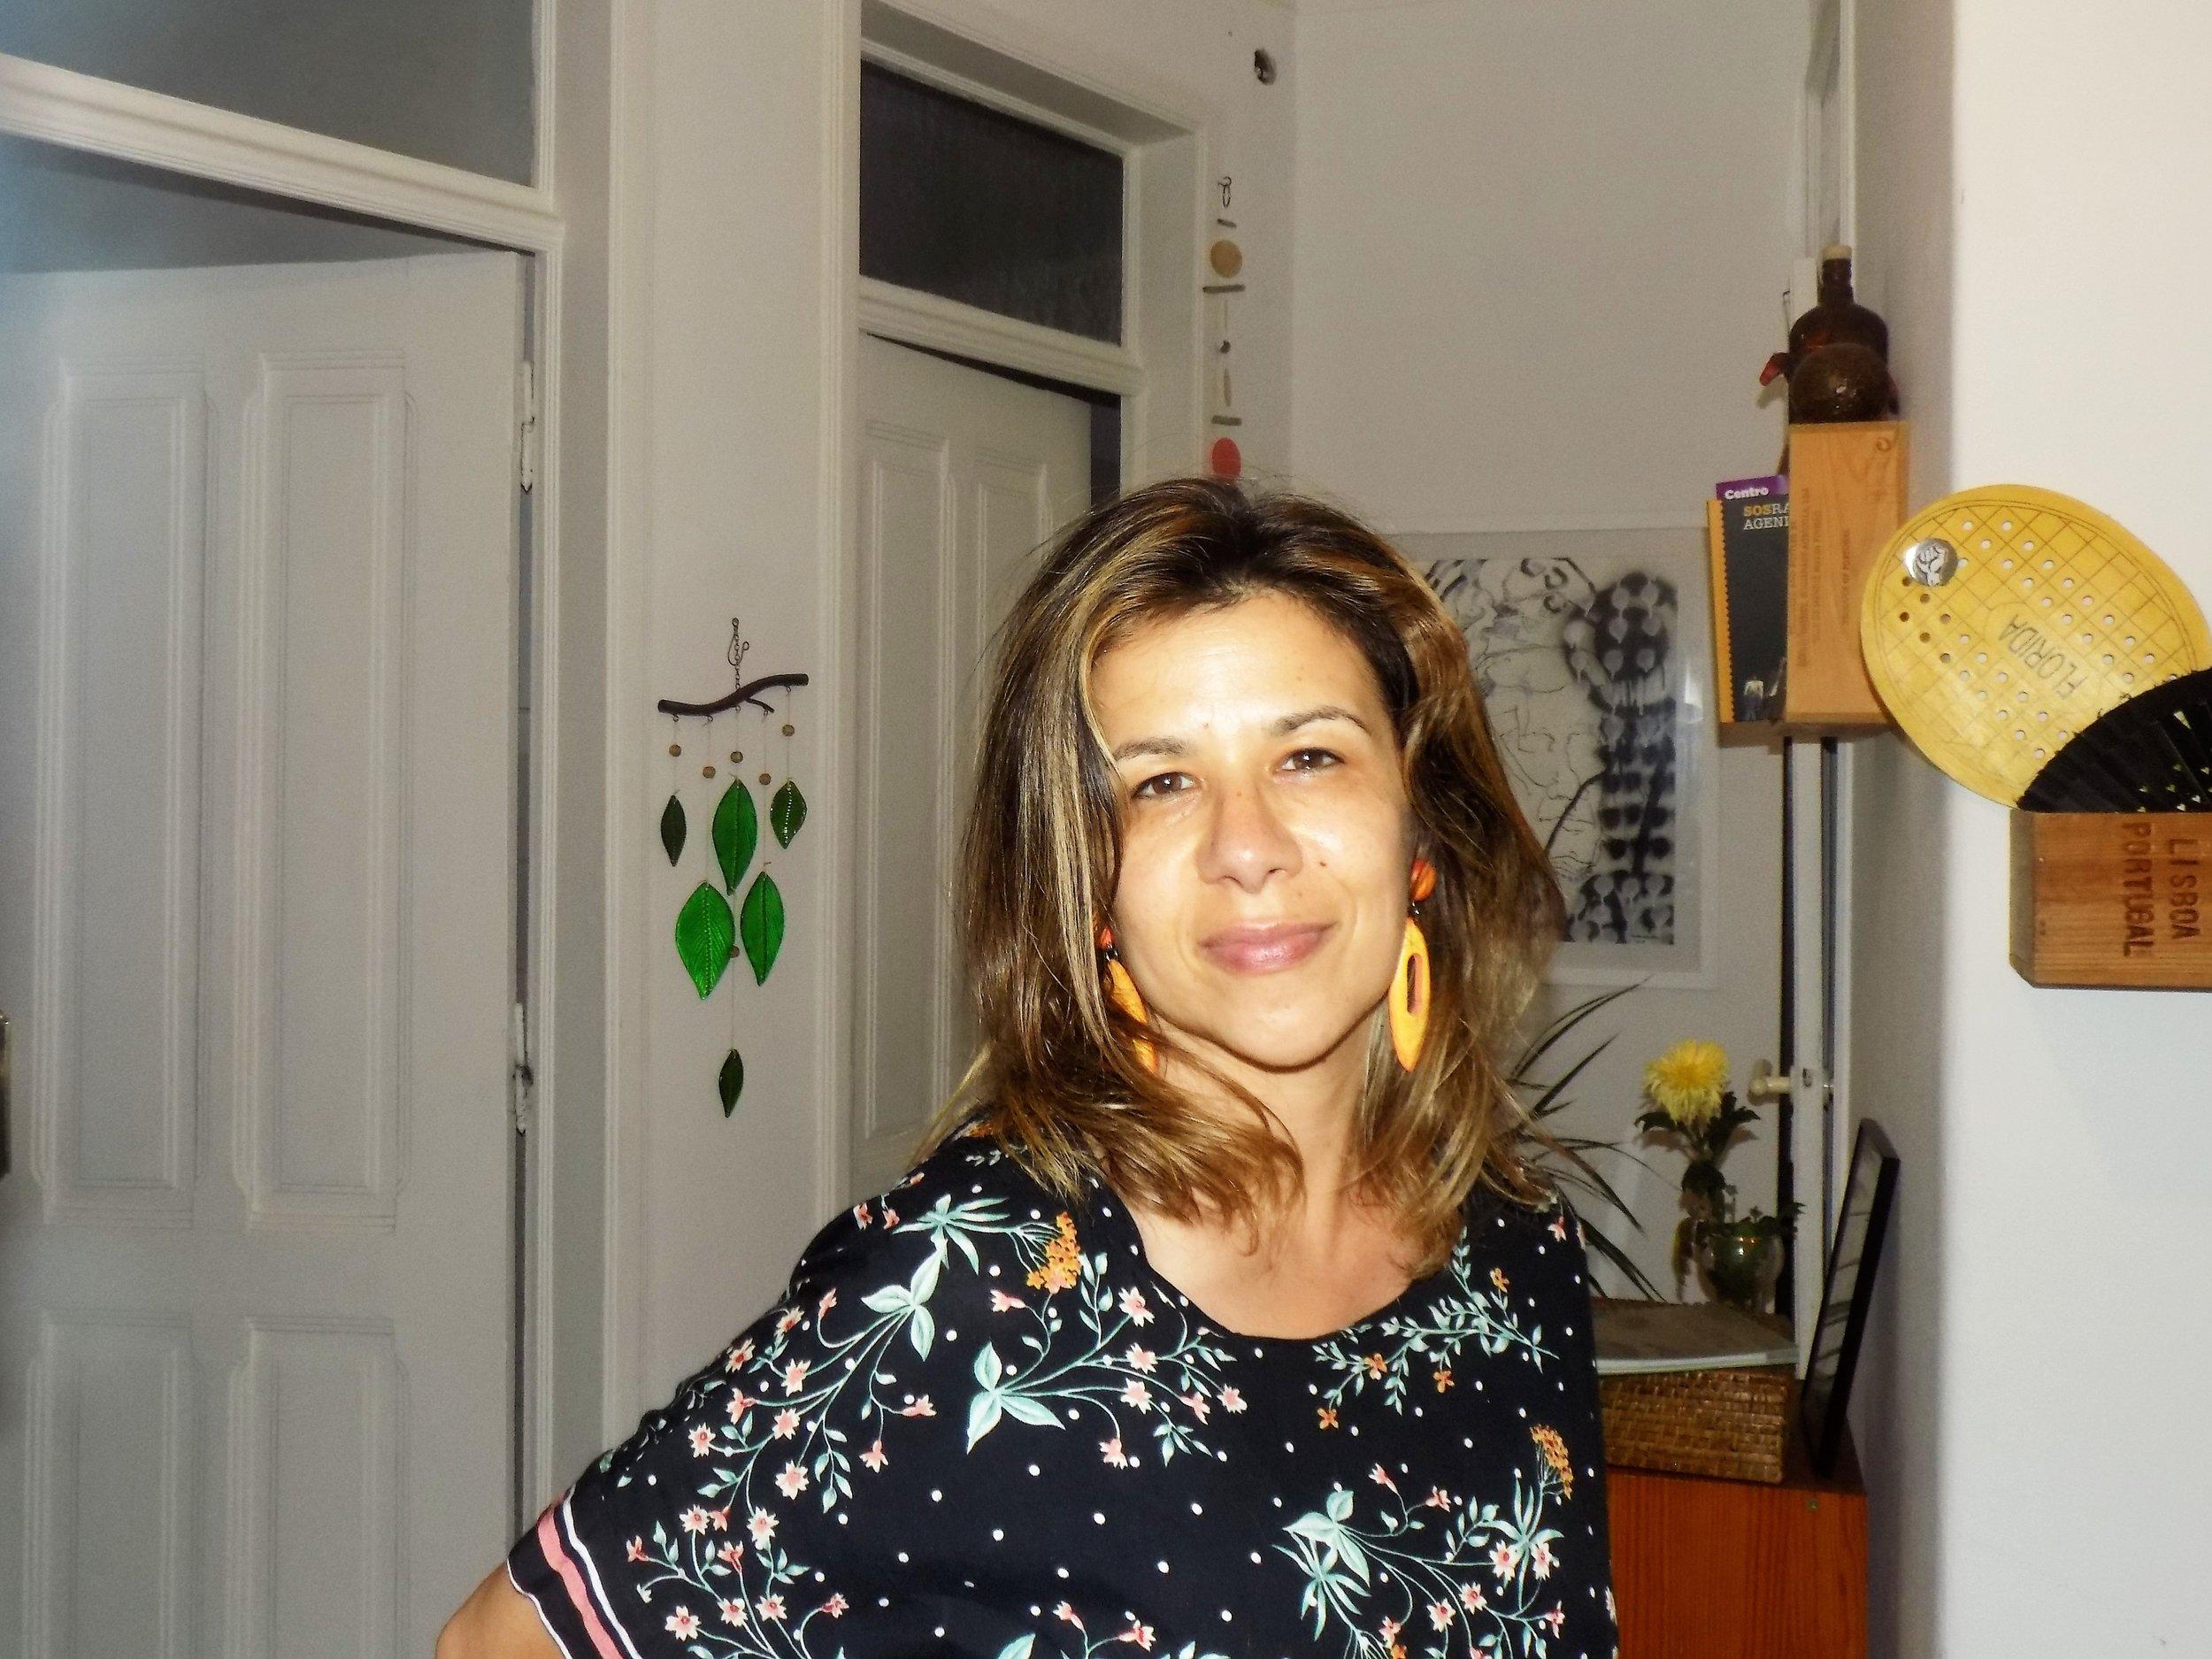 Soraia Simoes Miguel Freire.jpg